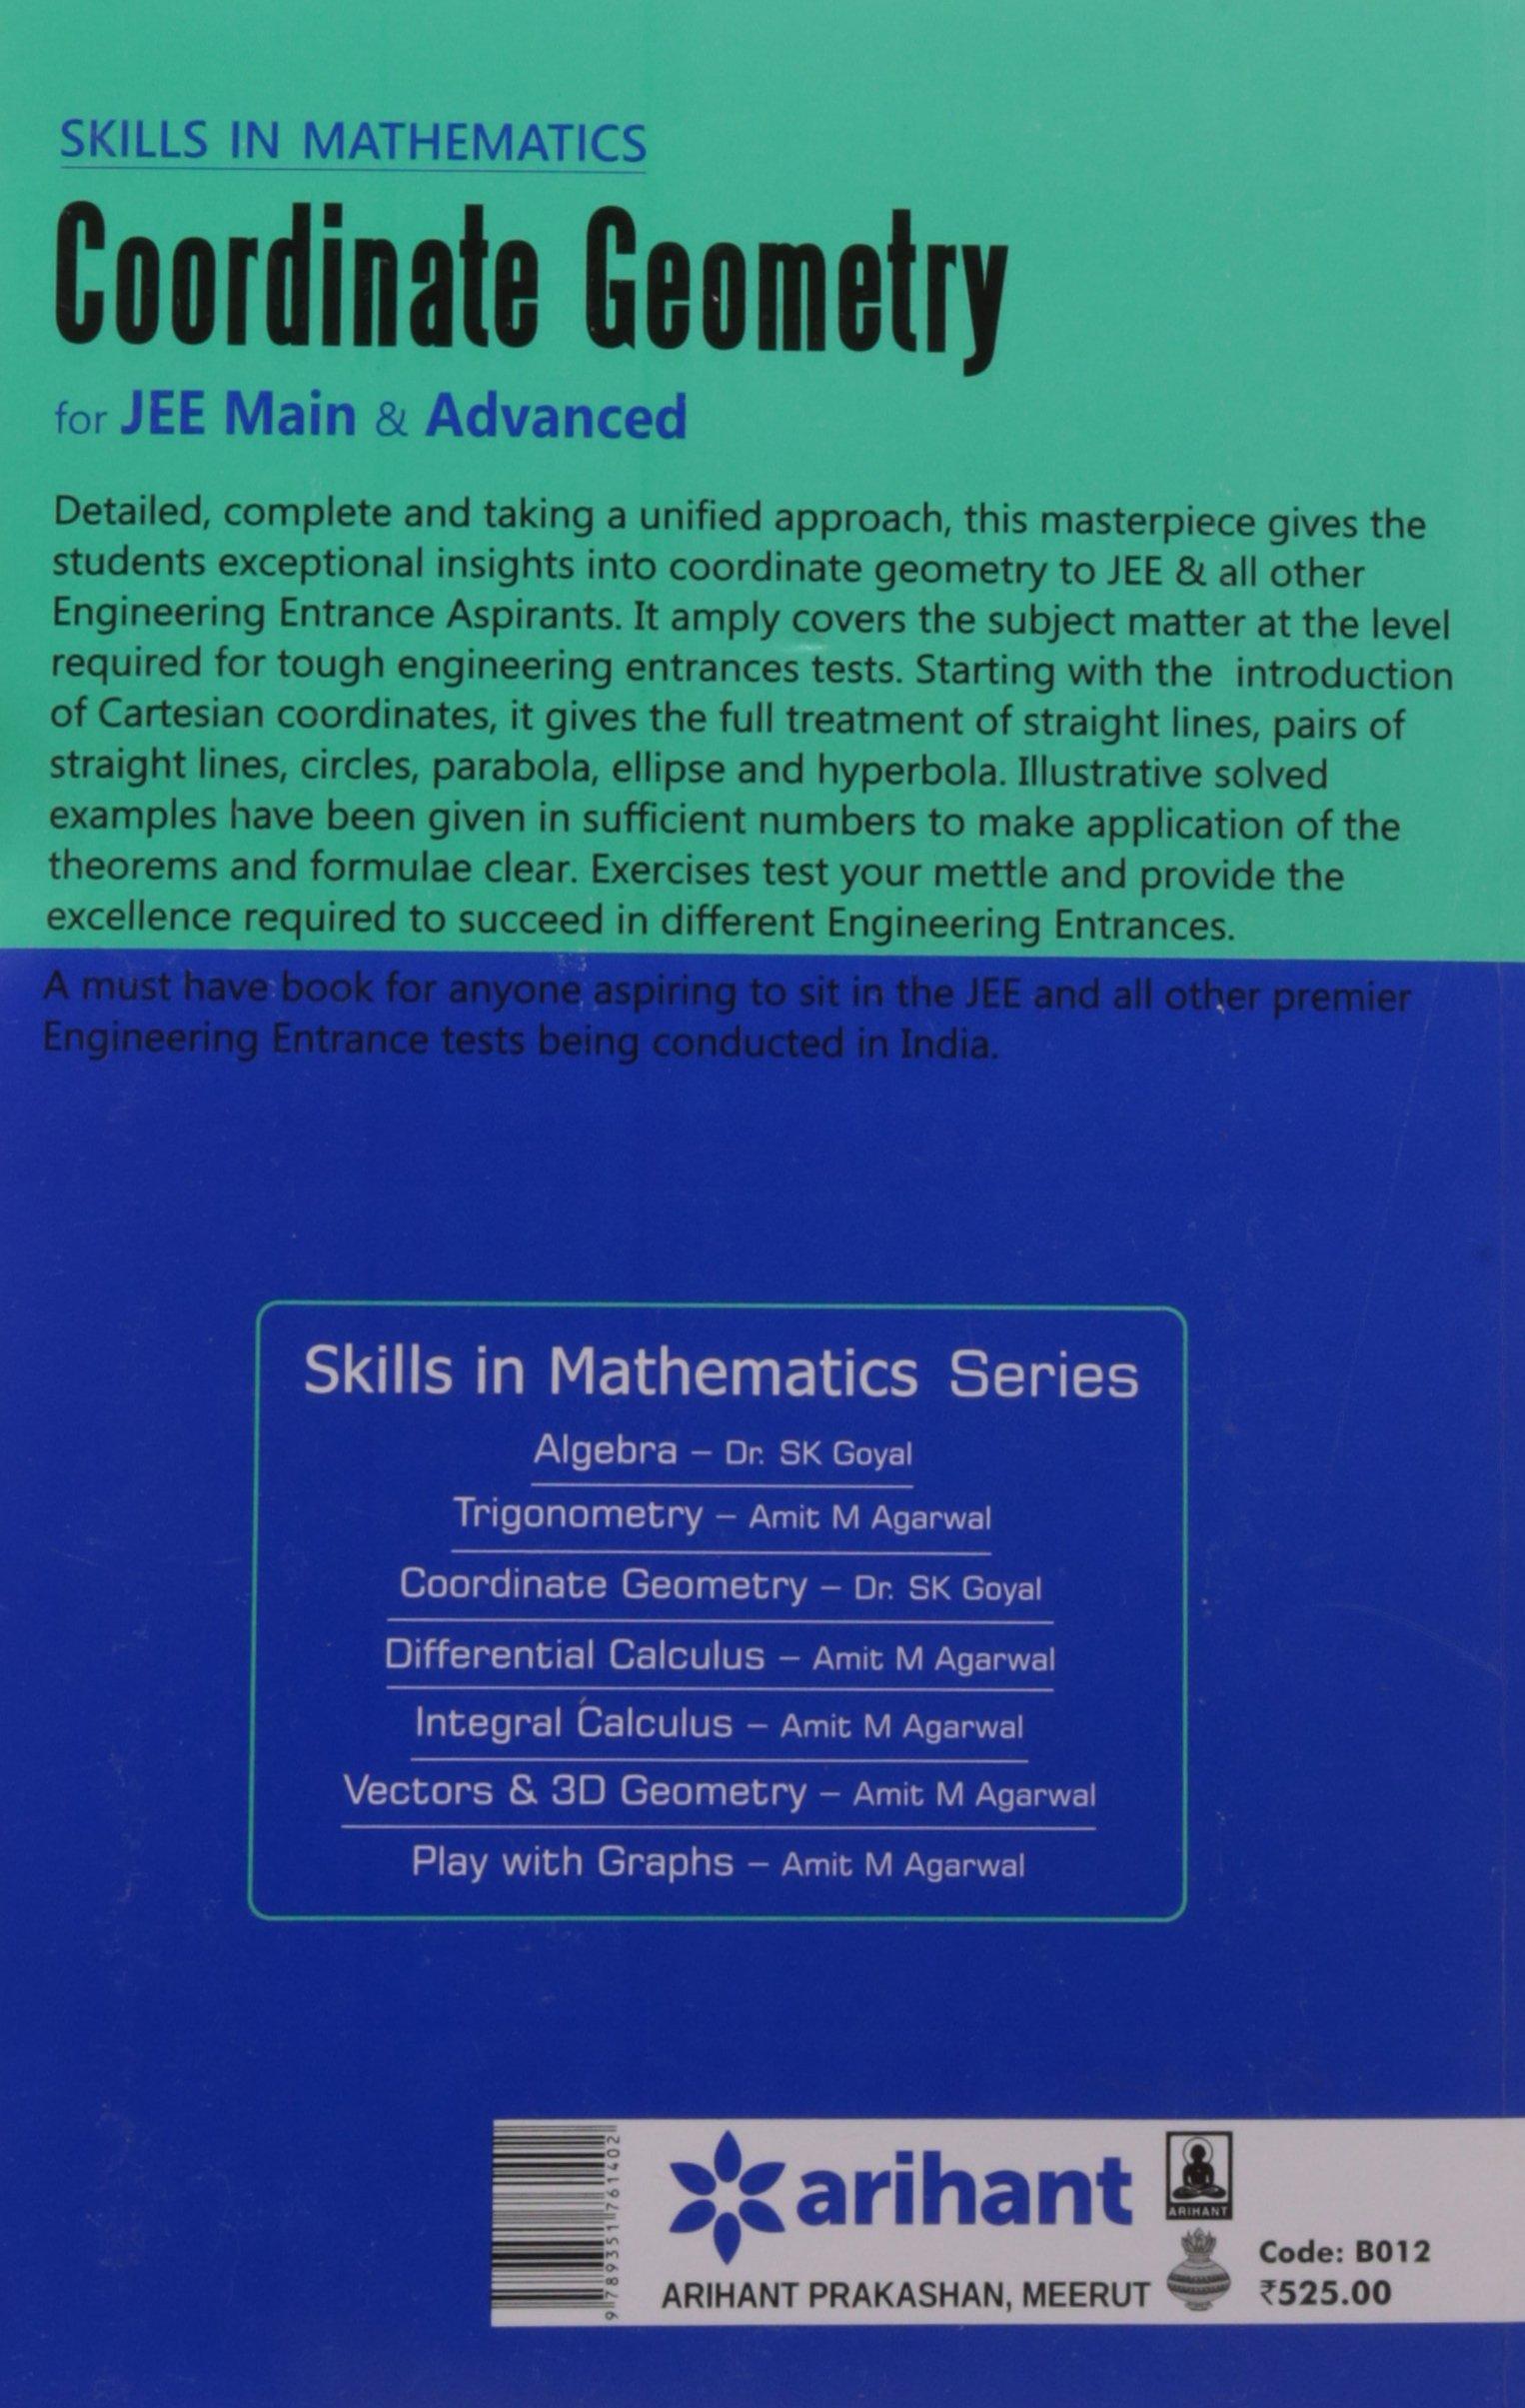 Buy Skills In Mathematics - COORDINATE GEOMETRY for JEE Main ...